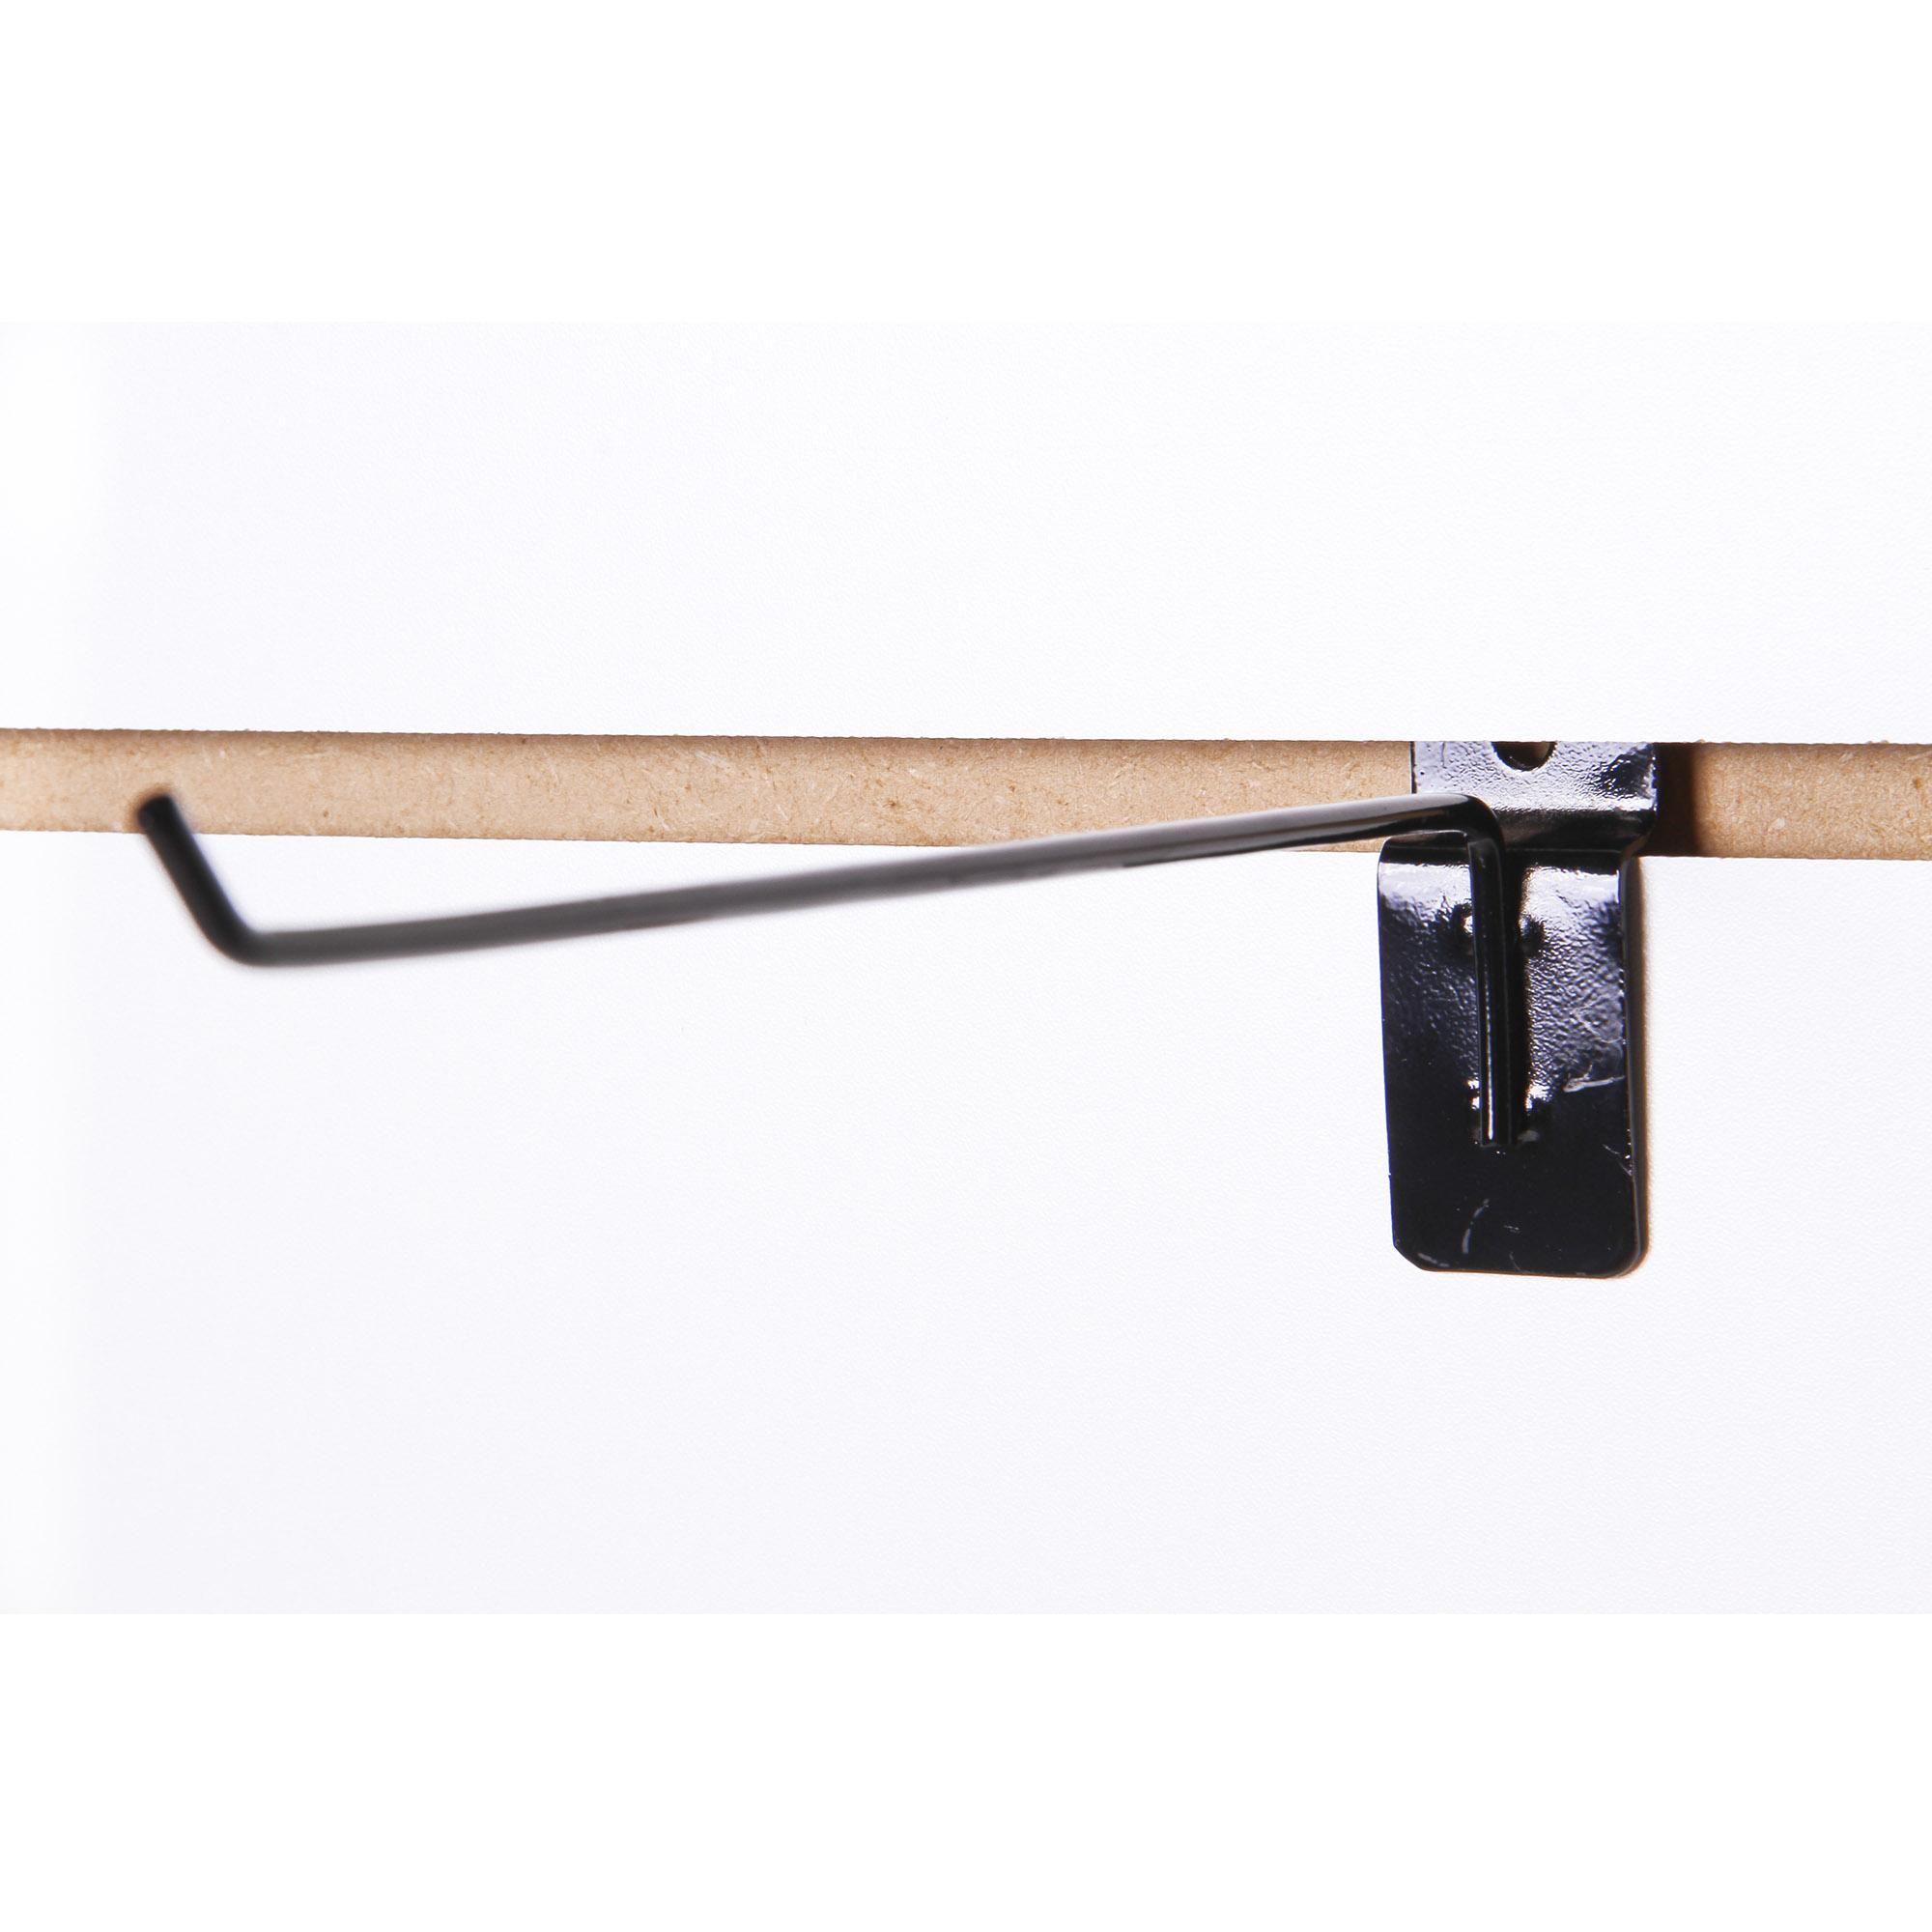 Kit Gancho Painel Canaletado 15cm - 50 Unidades